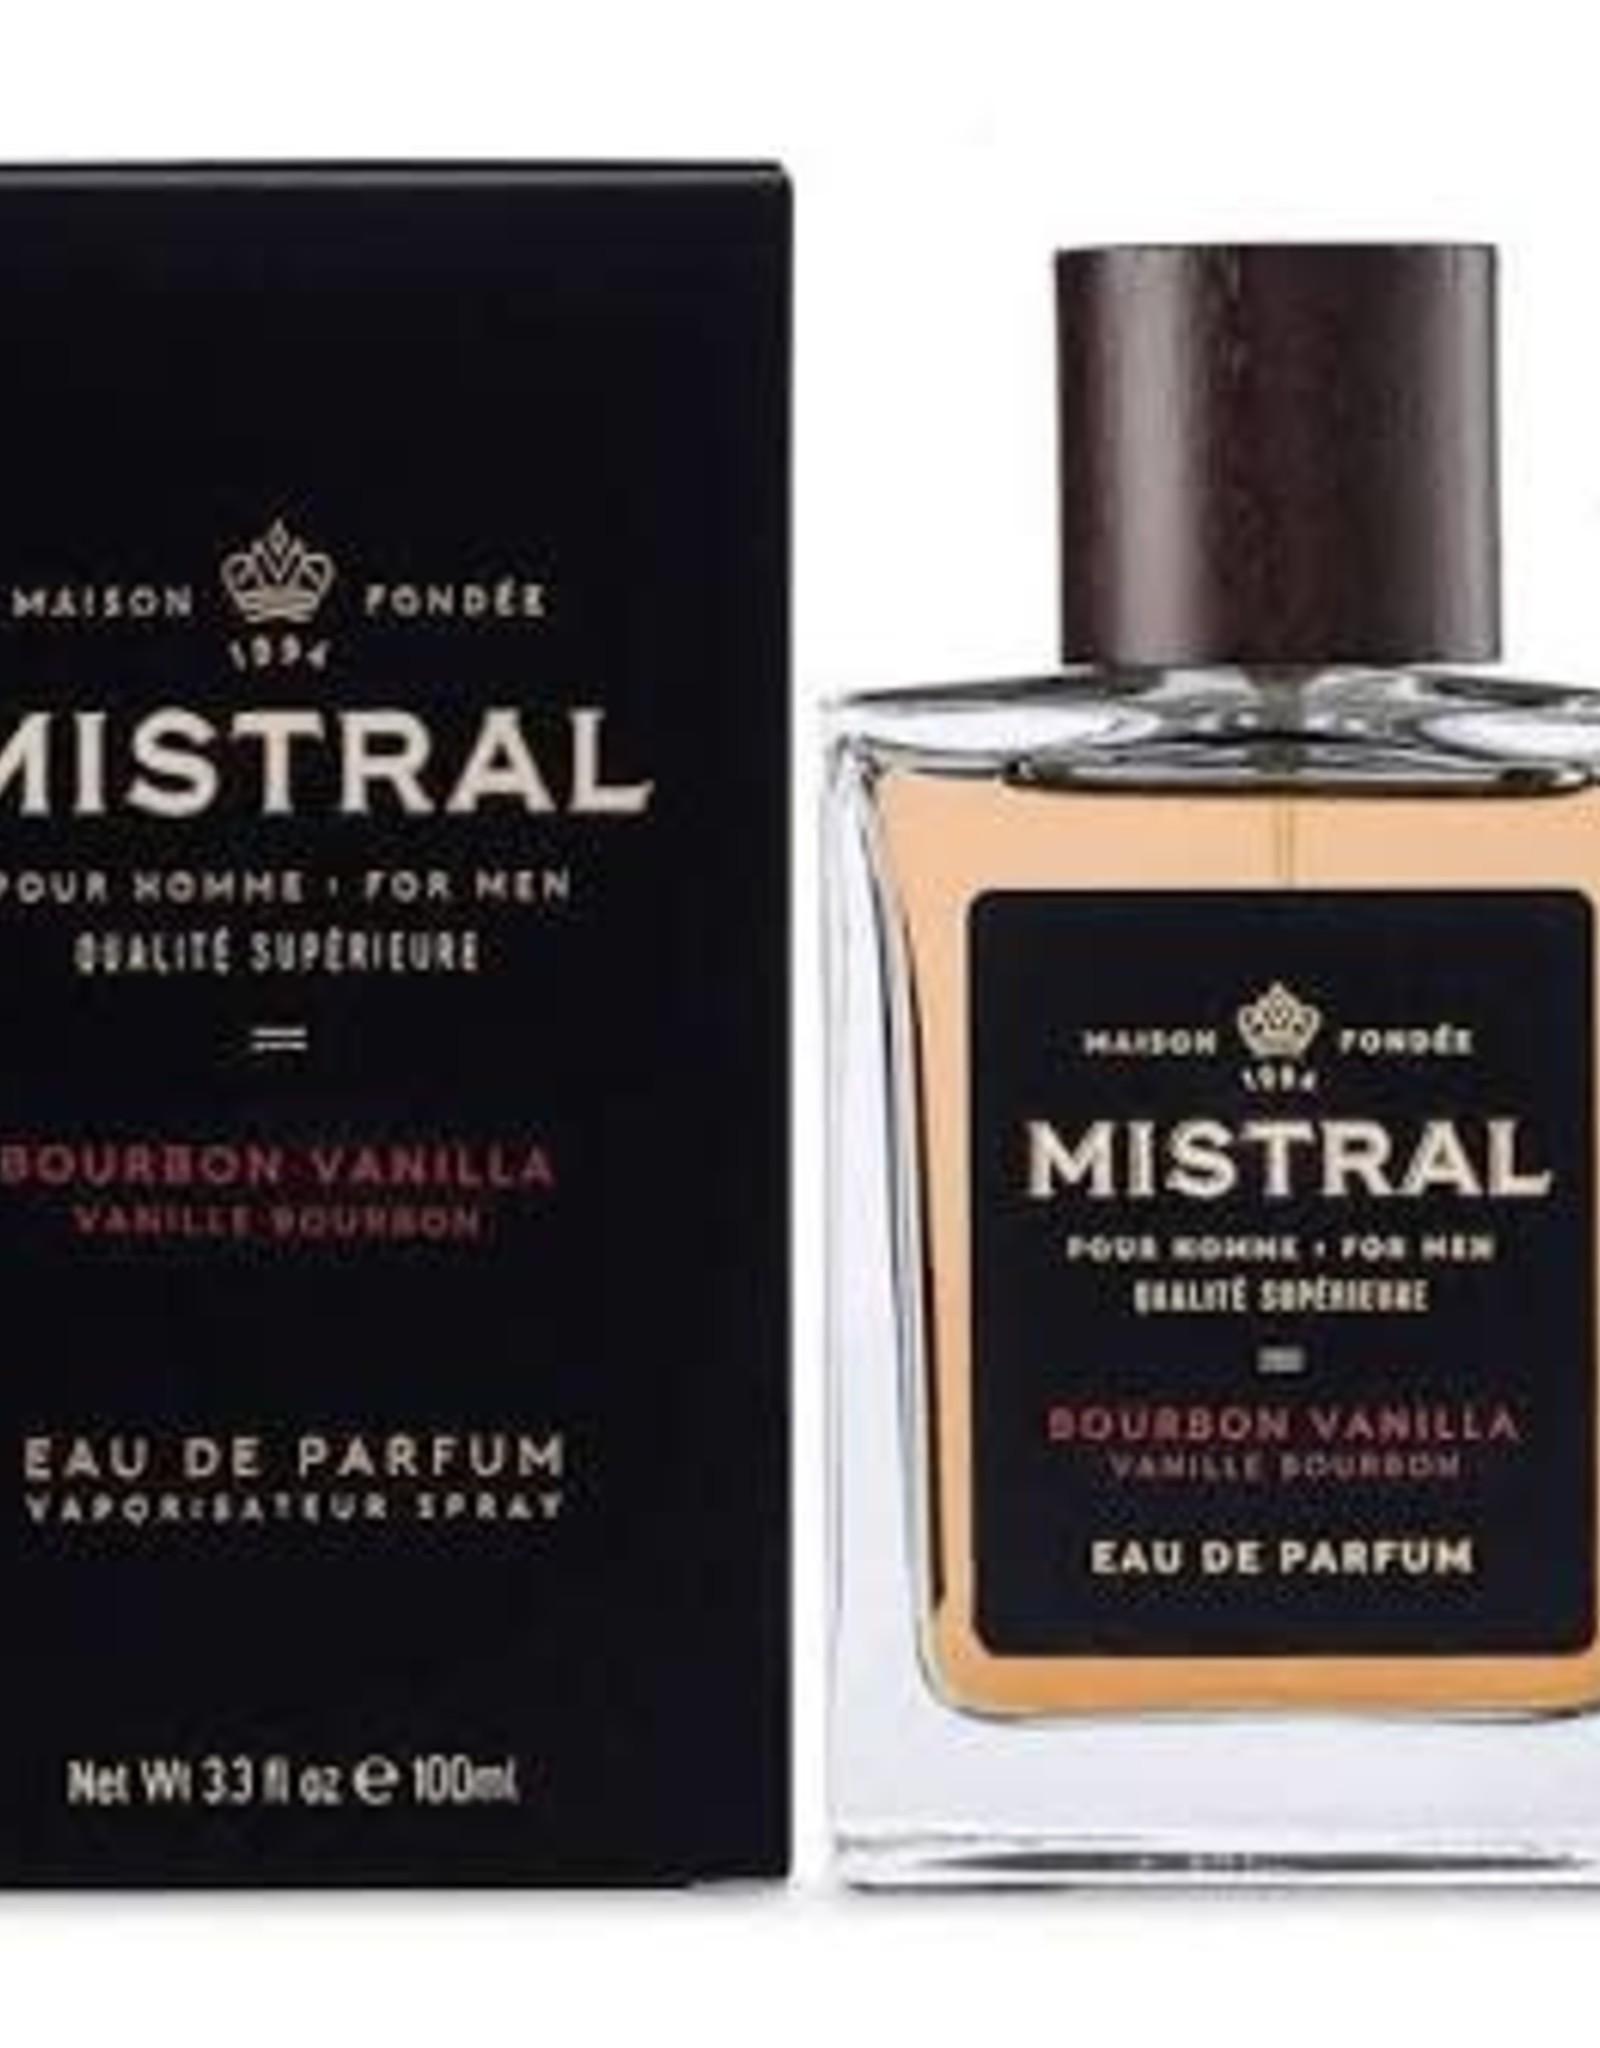 Mistral, LLC Bourbon Vanilla Men's Cologne